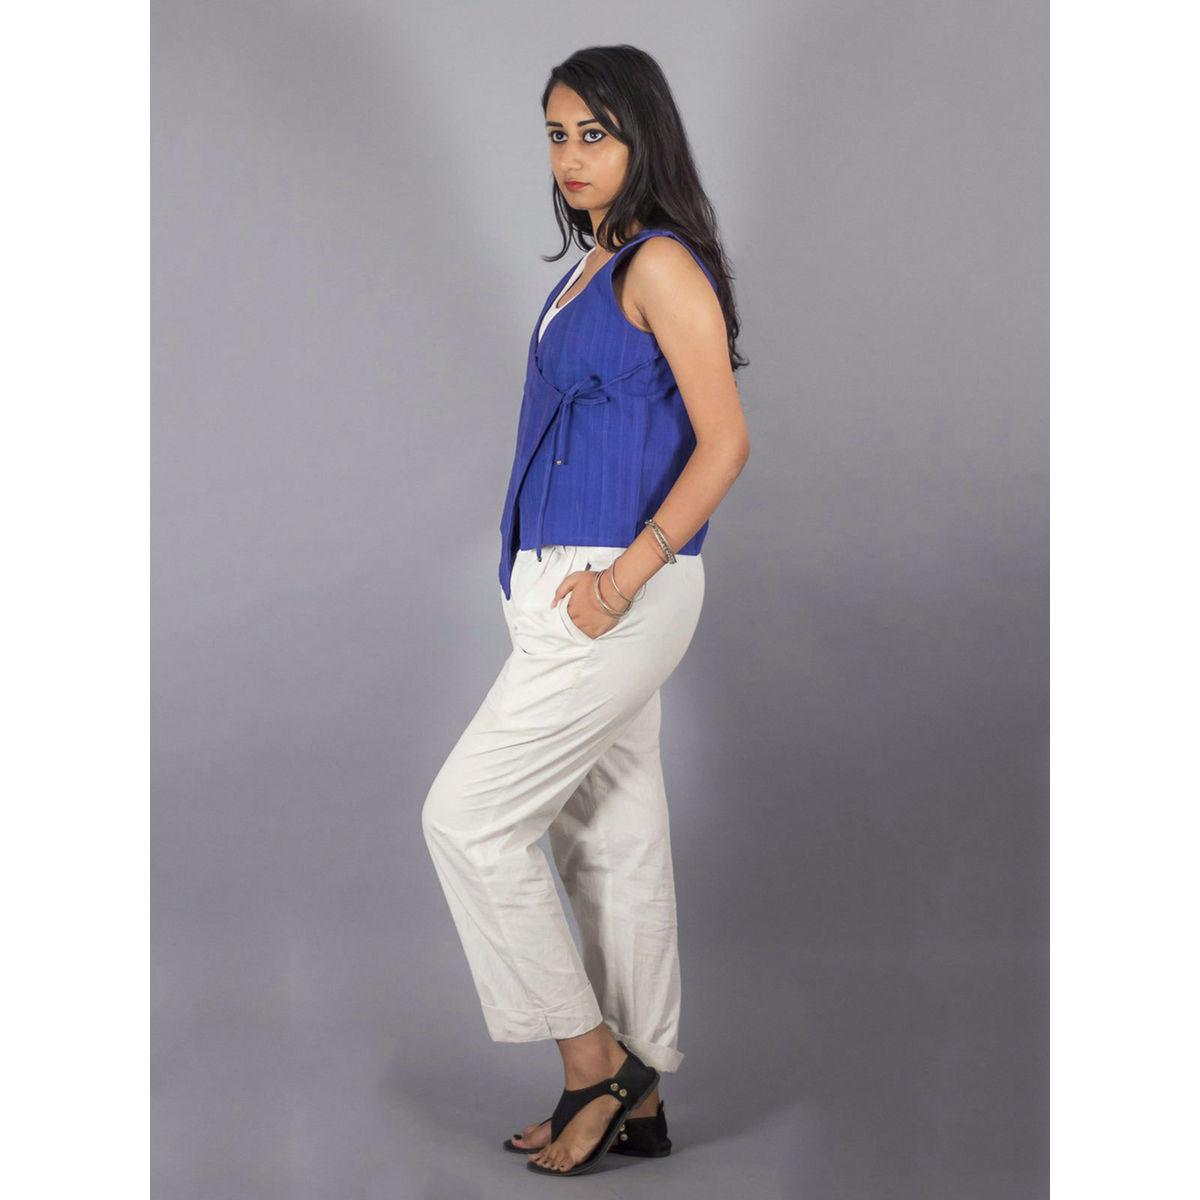 Cotton Breeze Blue Angarkha